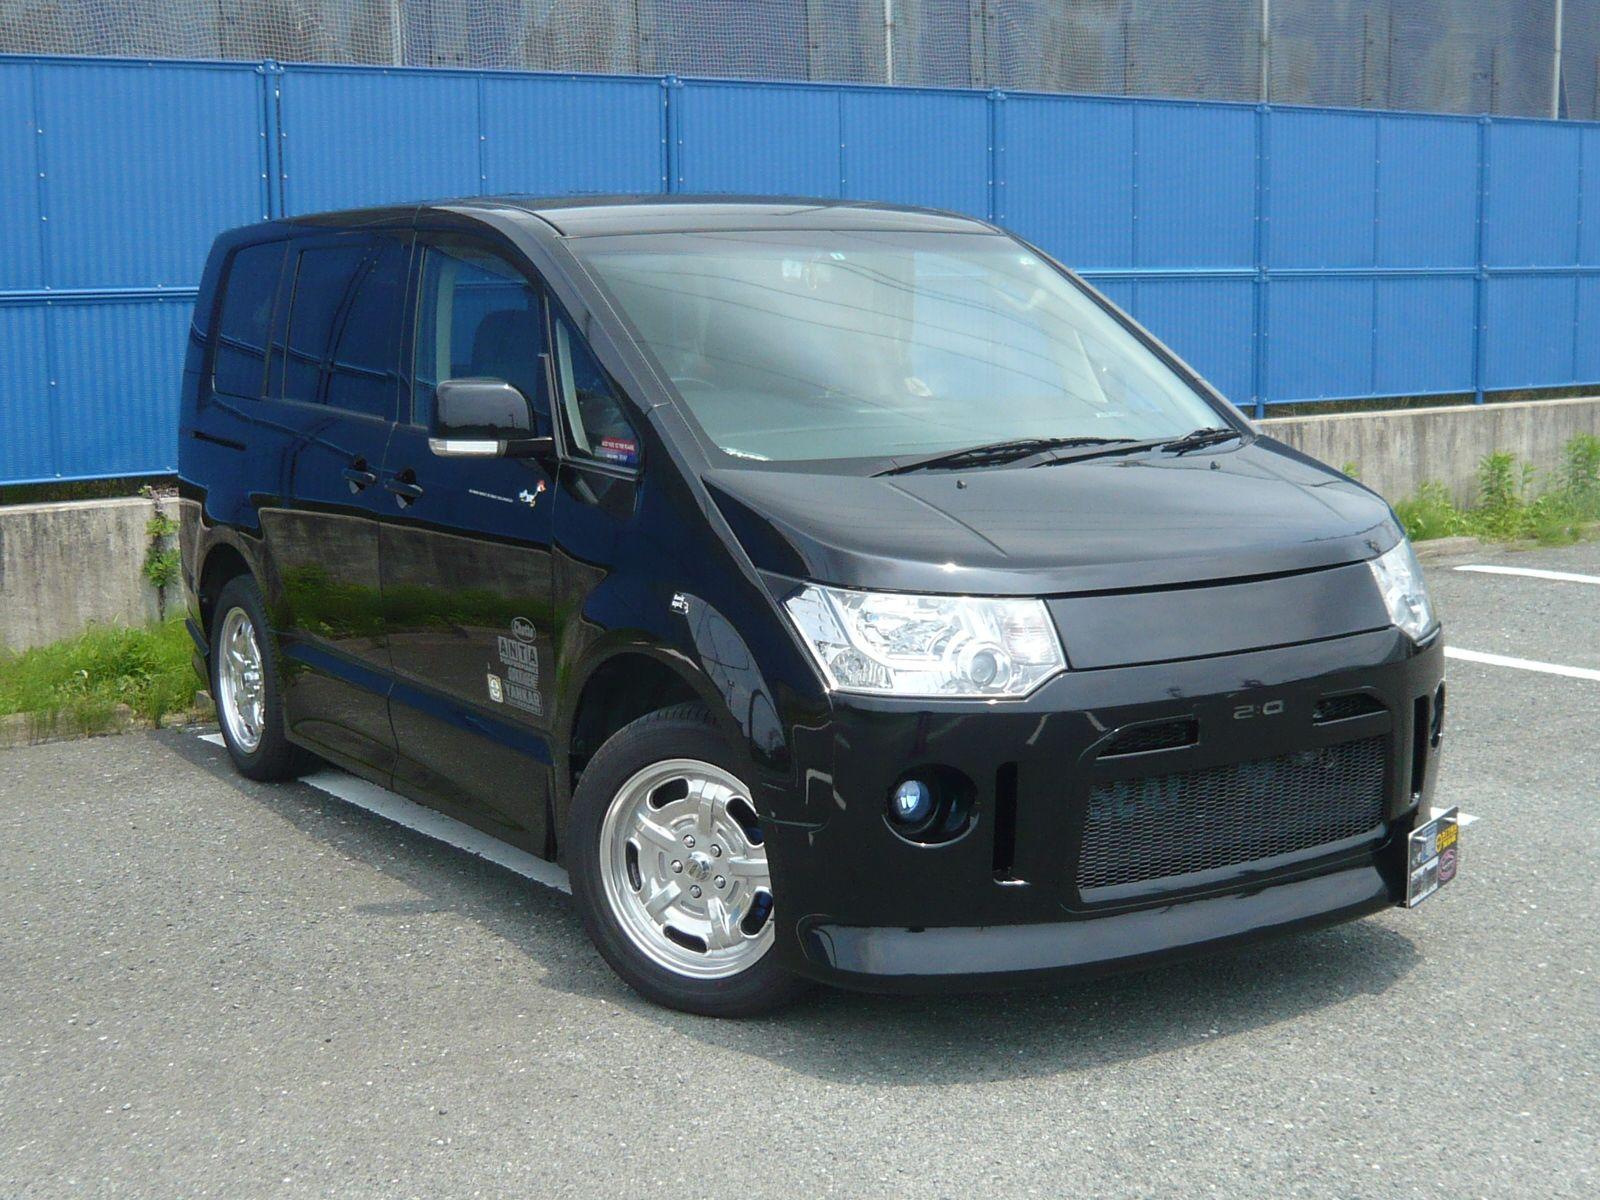 no431 ニックネーム Rartz メーカー名 車種 年式 Mitsubishi D 5 アピールポイント 動く家宝です インテリアパネルにスネークモータース社長の直筆サイン ステッカー 外観はホイール ナンバー位置移動などファミリーコブラを インテリア パネル